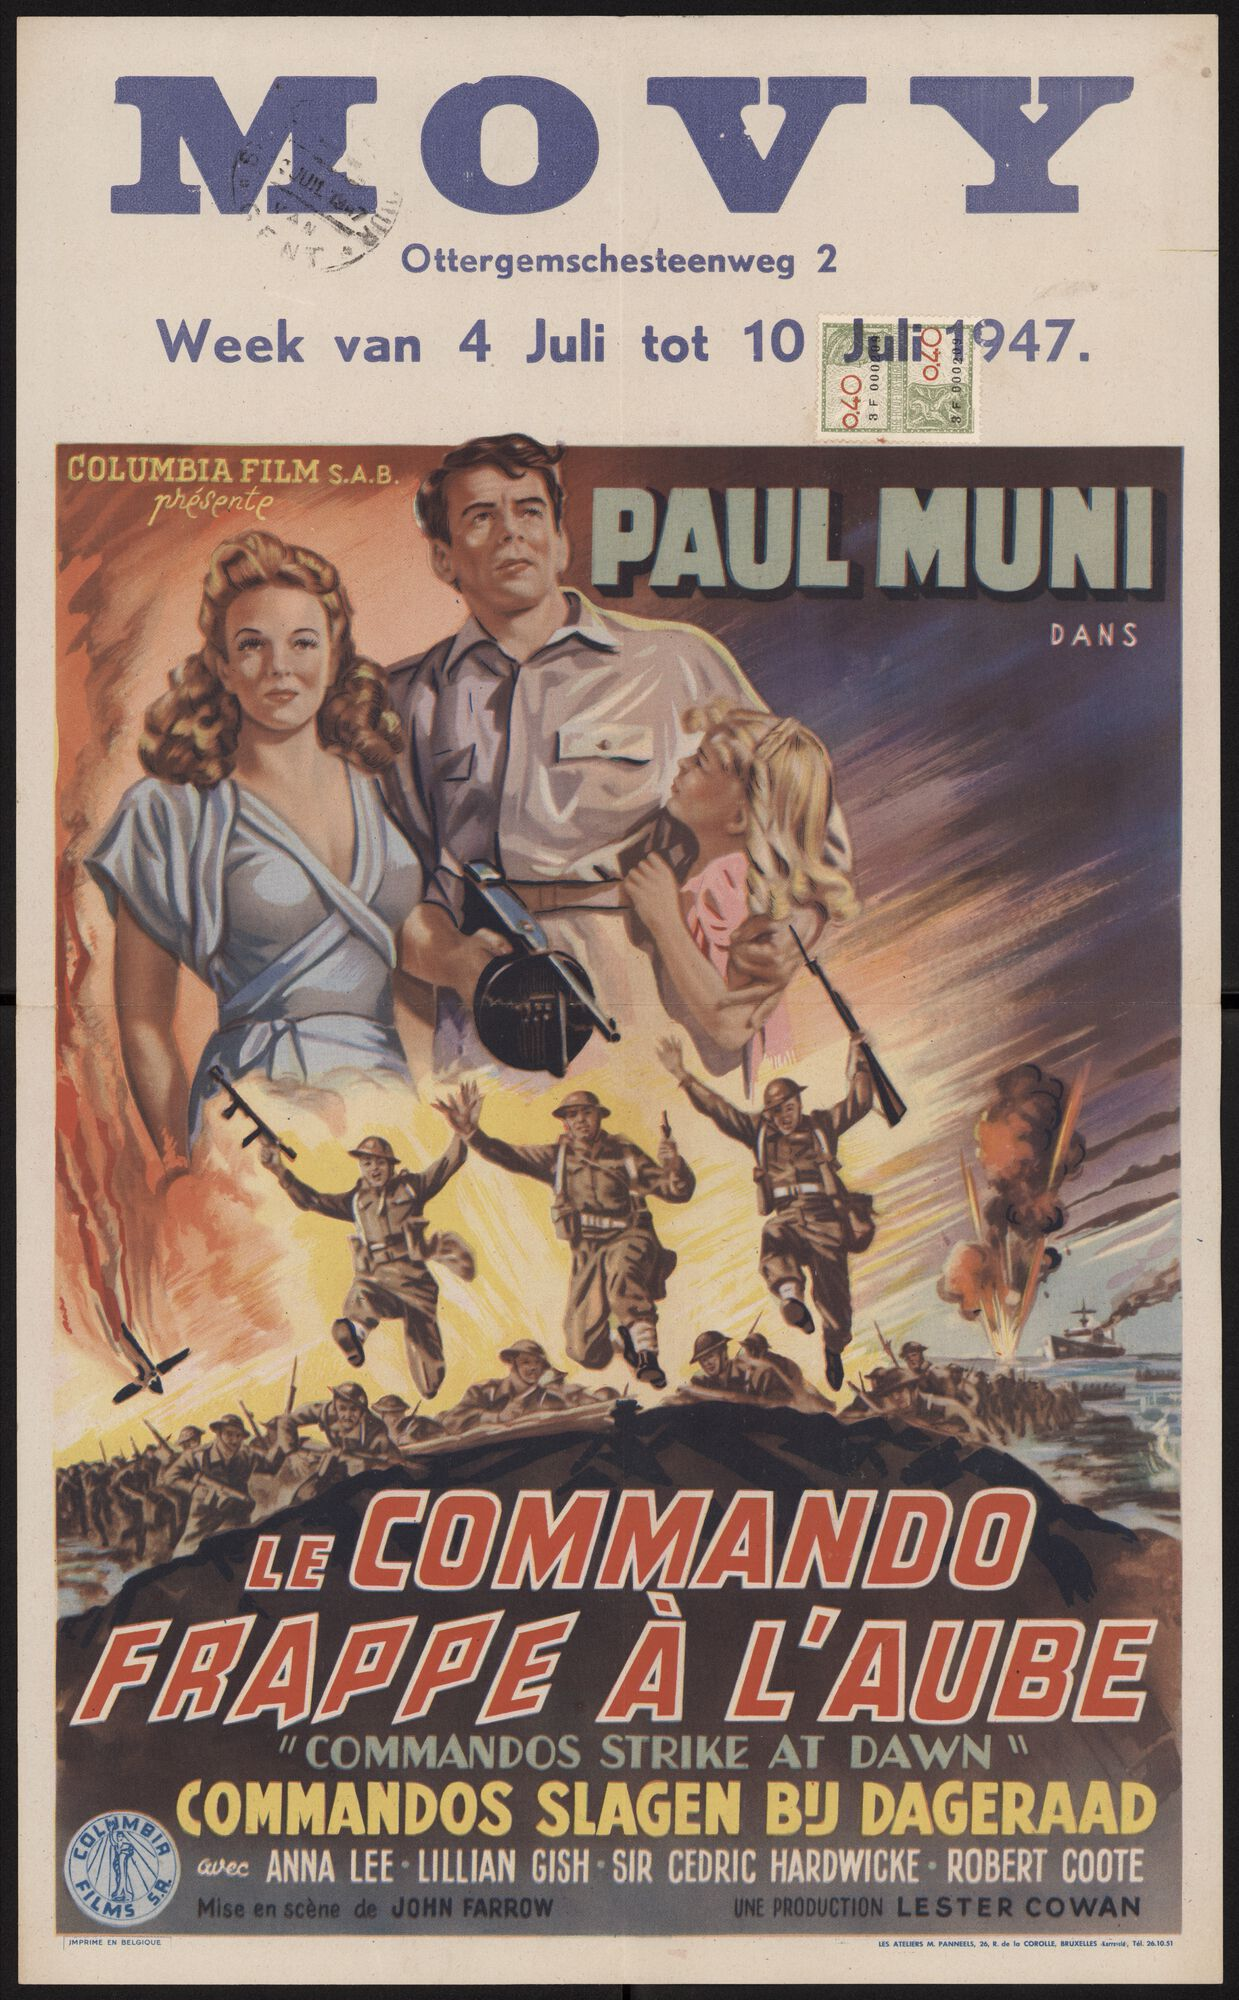 Commandos Strike at Dawn   Le commando frappe à l'aube   Commandos slagen bij dageraad, Movy, Gent, 4 - 10 juli 1947